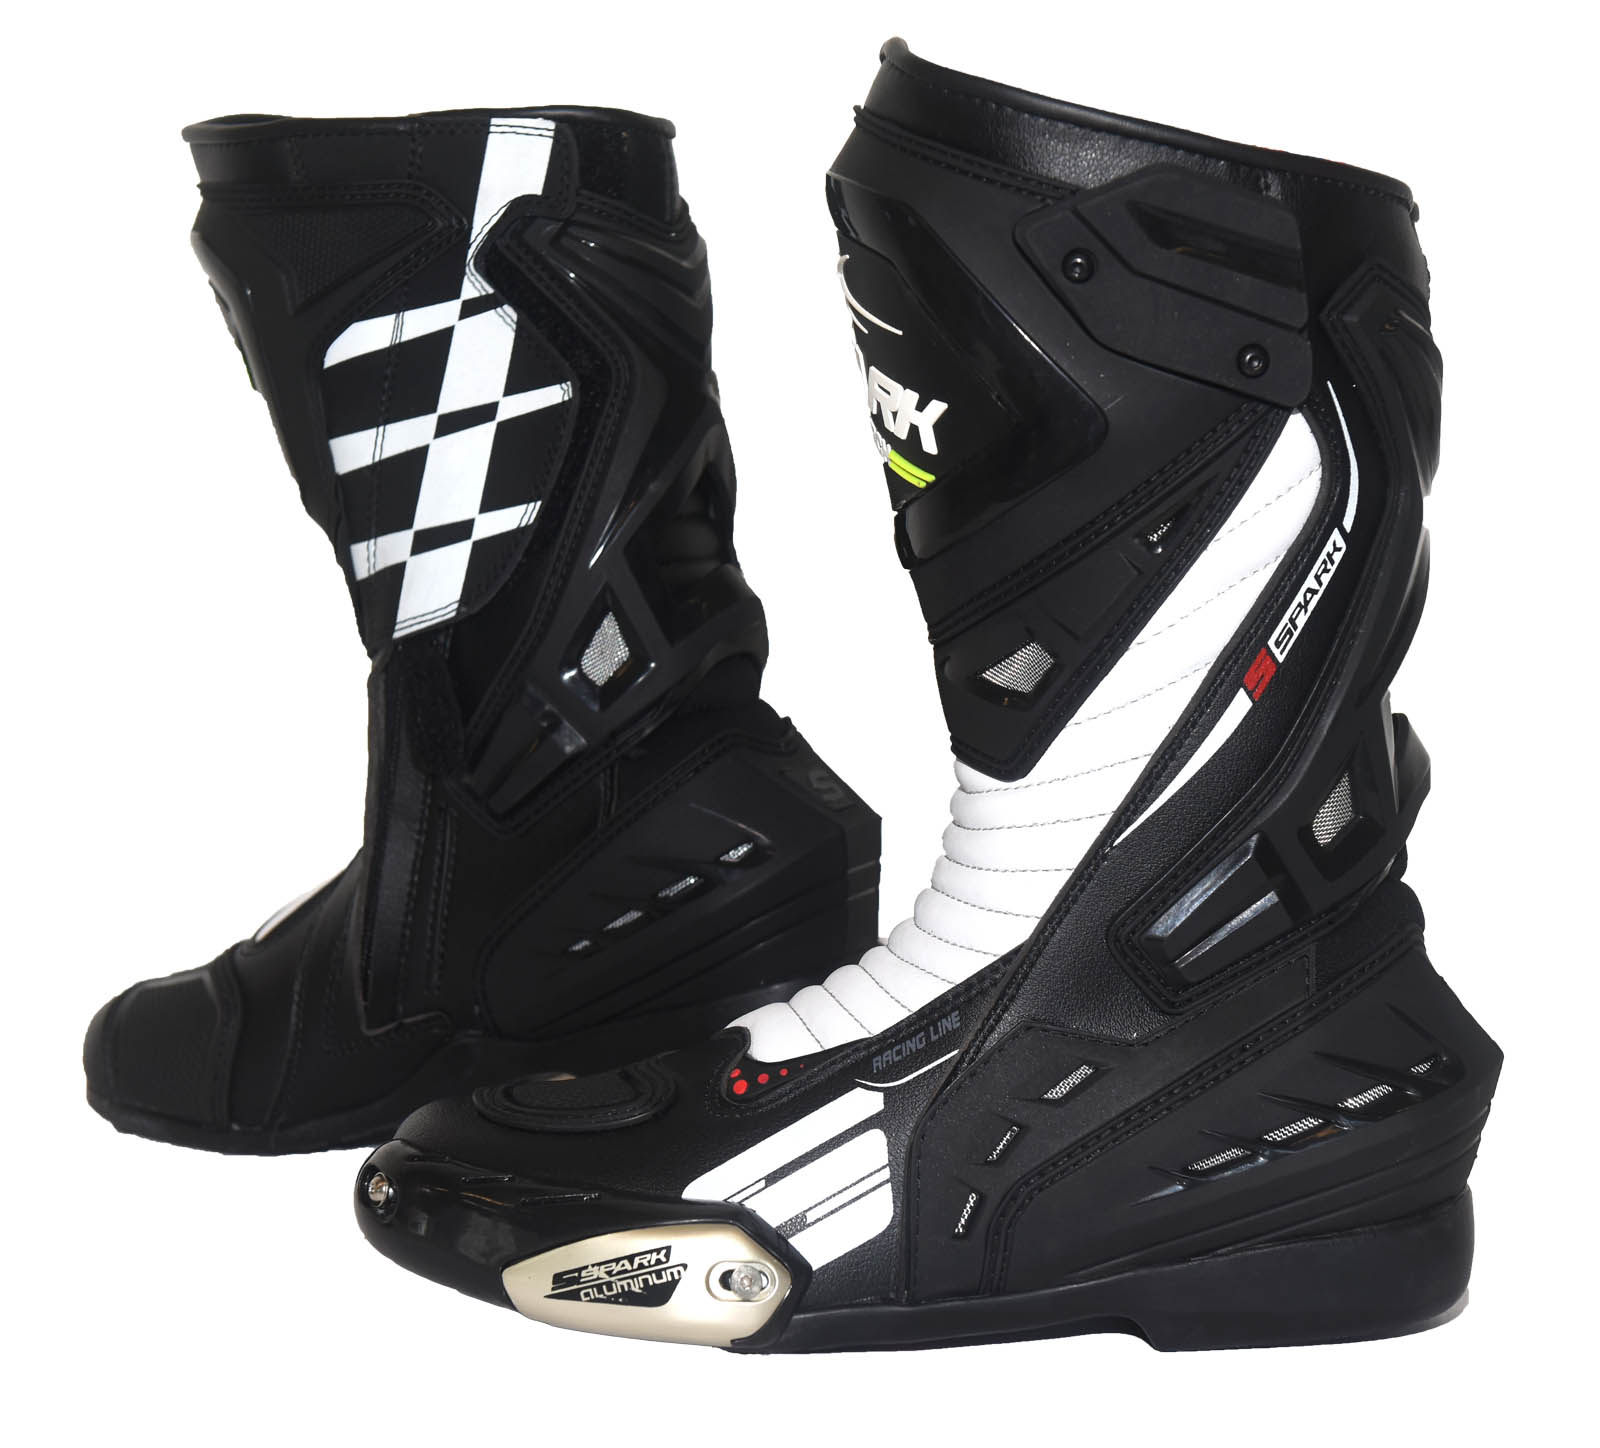 Jak vybrat moto boty  - GlobalMoto.cz 04384f9212